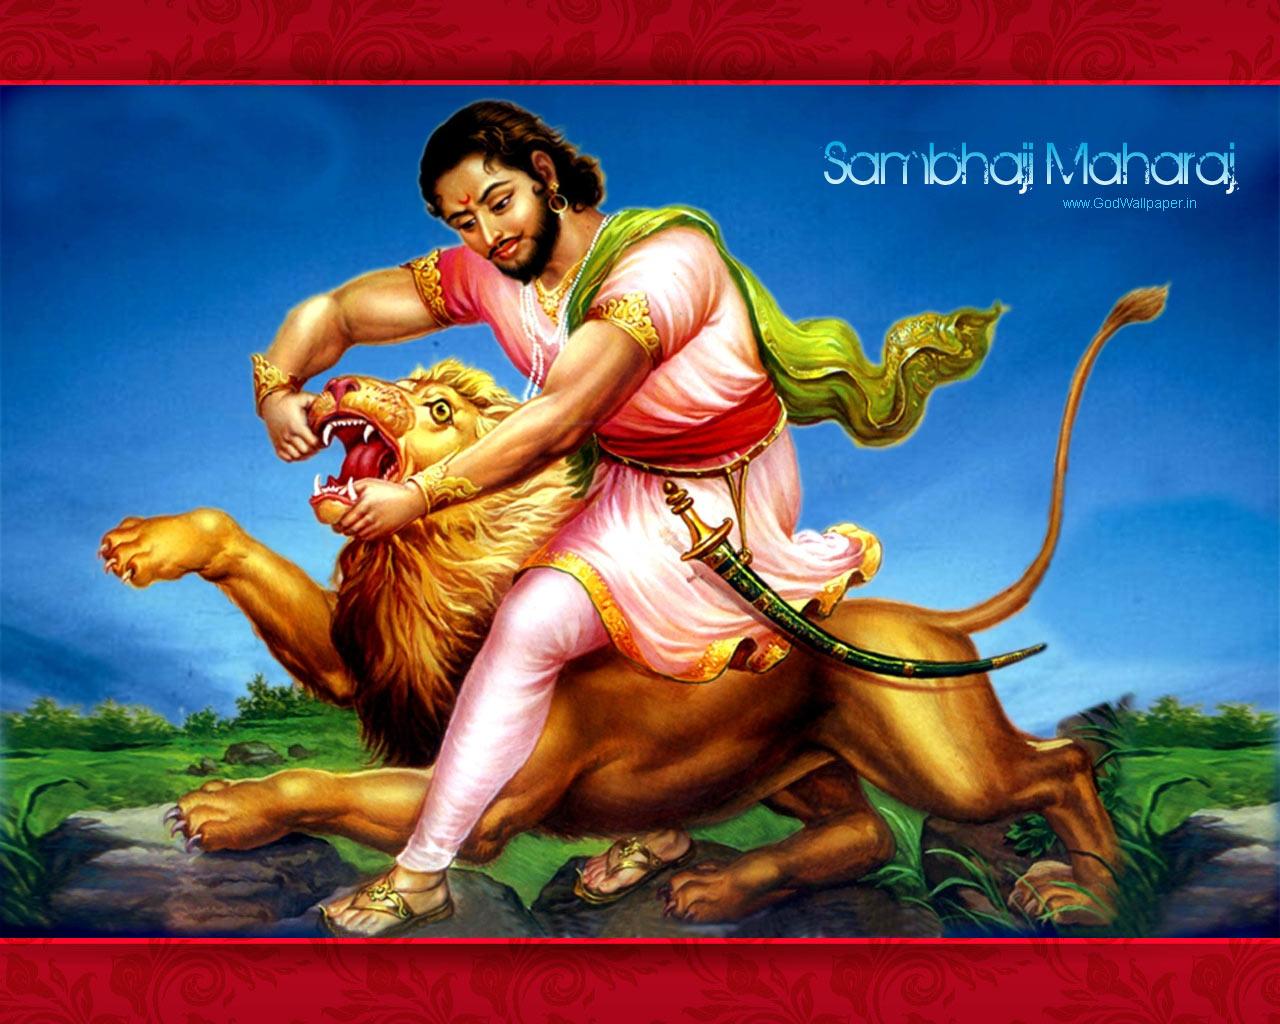 Sambhaji Maharaj Wallpapers Photos Images Download